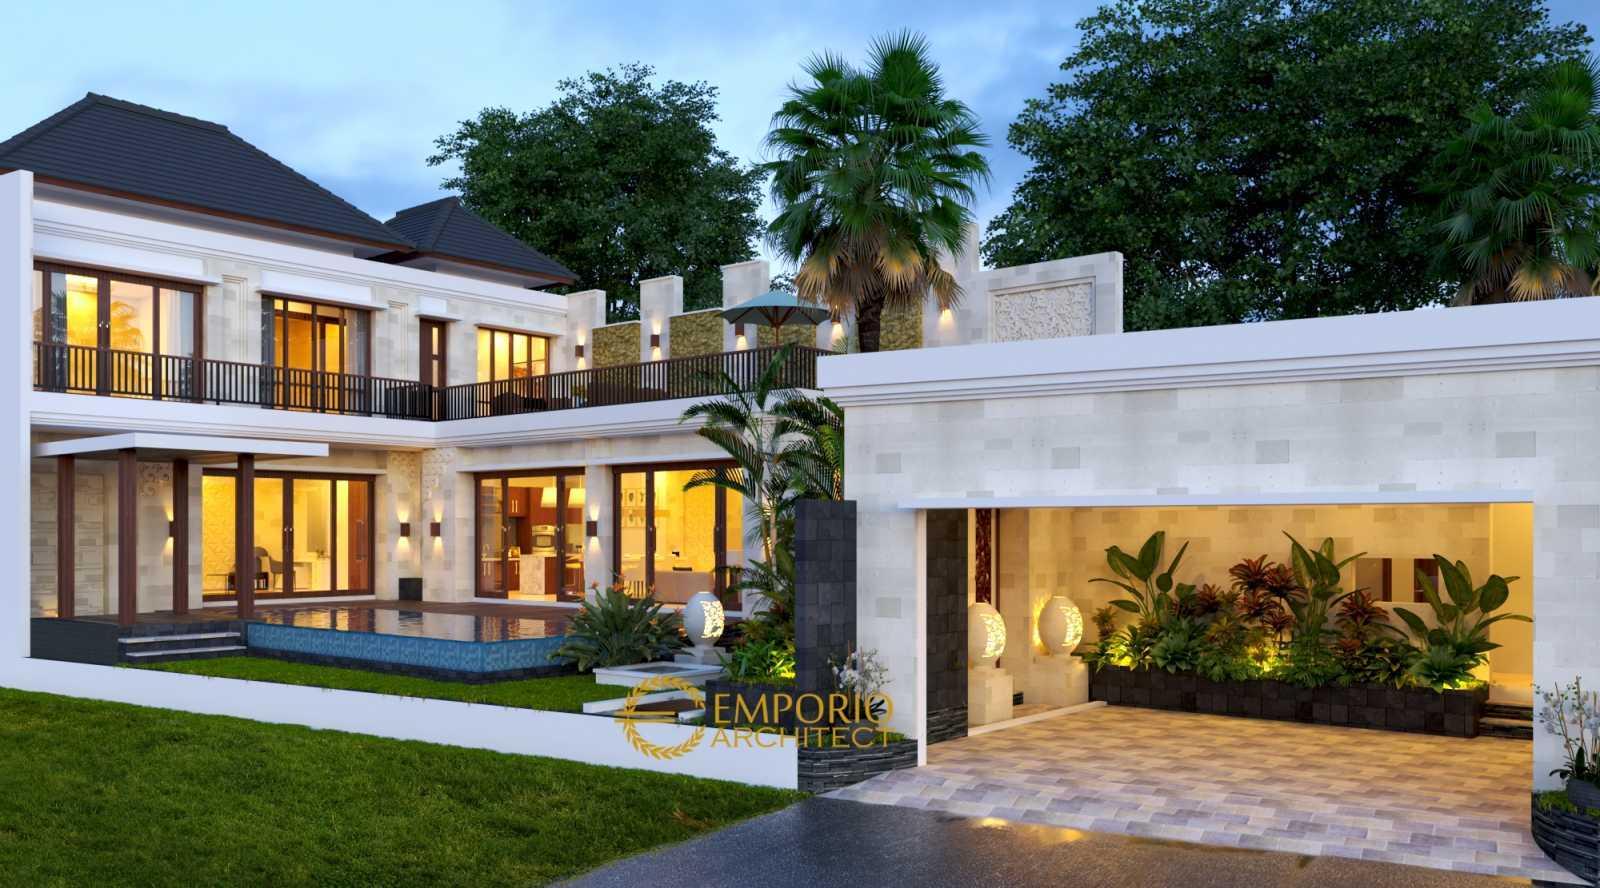 Emporio Architect Desain Rumah Villa Bali Tropis 587 @ Jimbaran, Badung, Bali Jimbaran, Kec. Kuta Sel., Kabupaten Badung, Bali, Indonesia Jimbaran, Kec. Kuta Sel., Kabupaten Badung, Bali, Indonesia Emporio-Architect-Desain-Rumah-Villa-Bali-Tropis-587-Jimbaran-Badung-Bali Tropical  76055